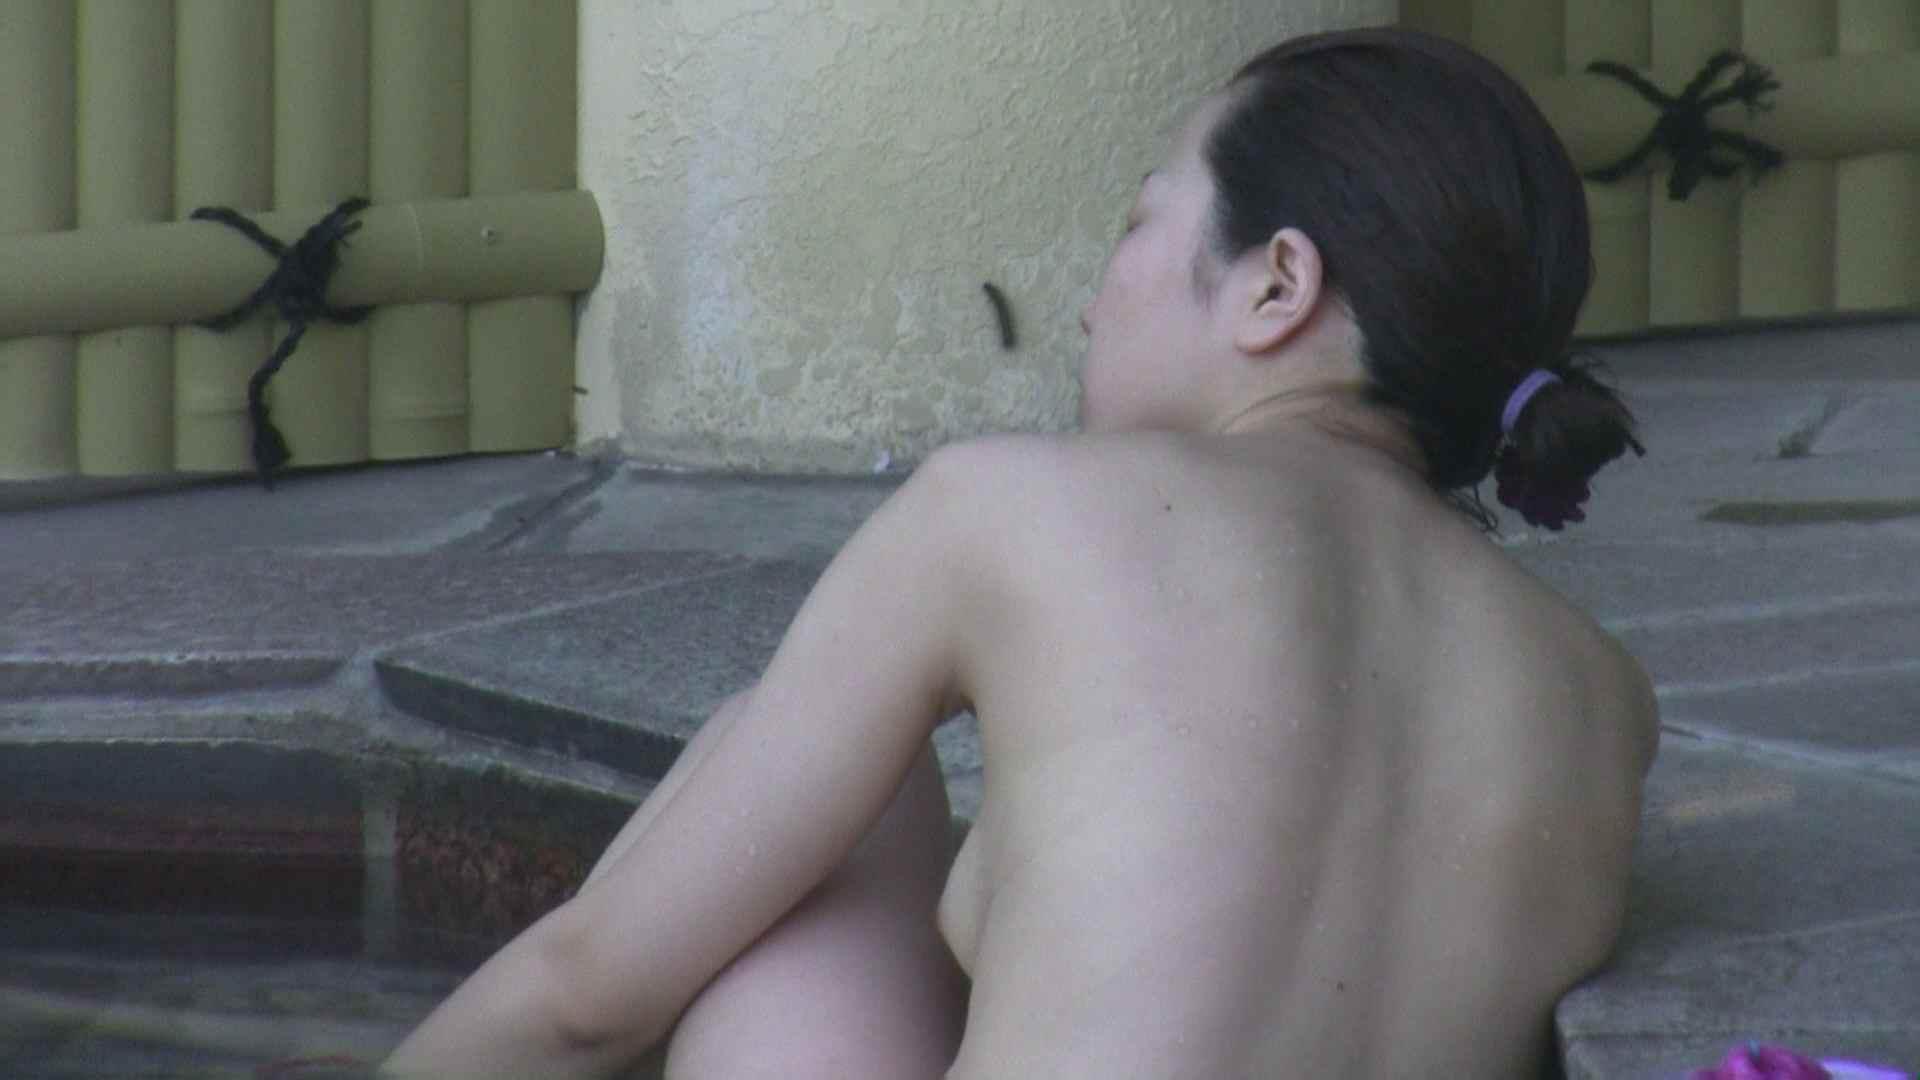 Aquaな露天風呂Vol.88【VIP限定】 盗撮 オマンコ無修正動画無料 61連発 50